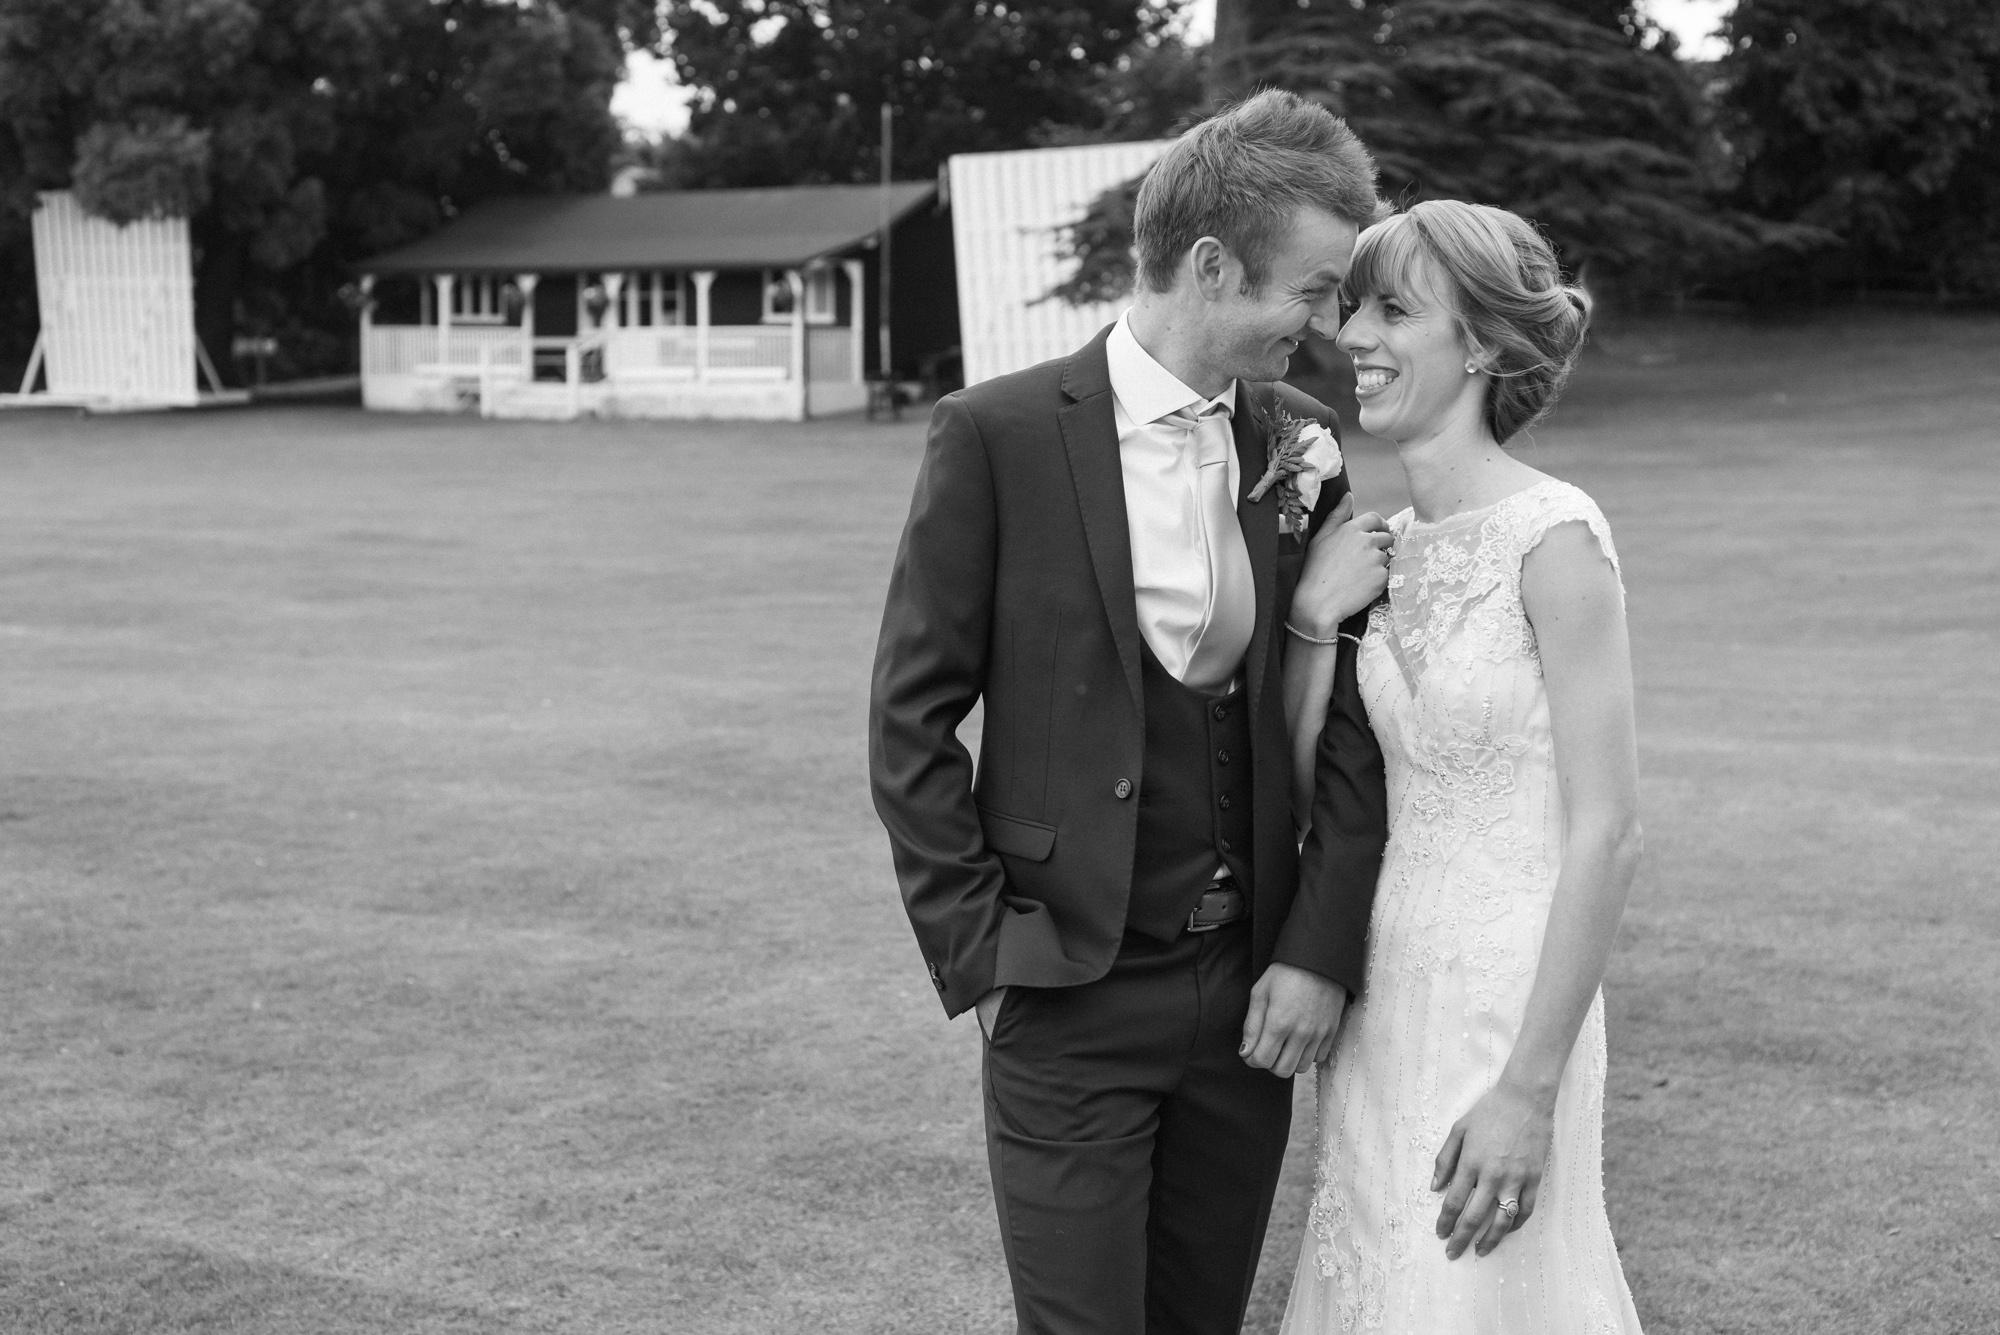 Cricket Club Wedding Tea Party Eversholt Bedfordshire-85